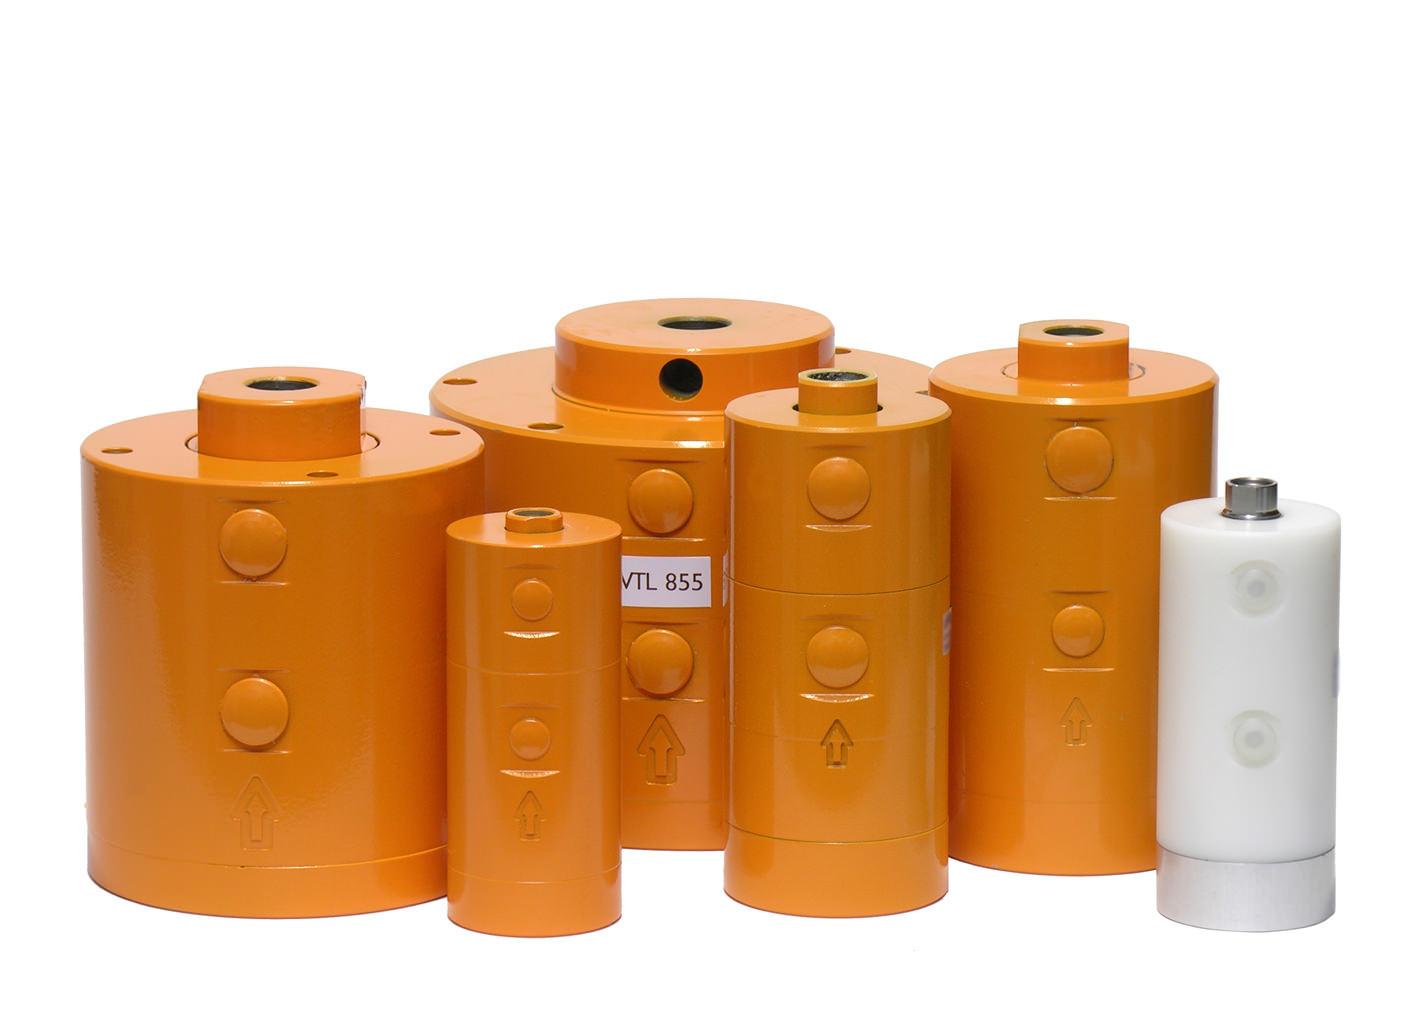 Druckluft-Äußerekolbenvibratoren VTL